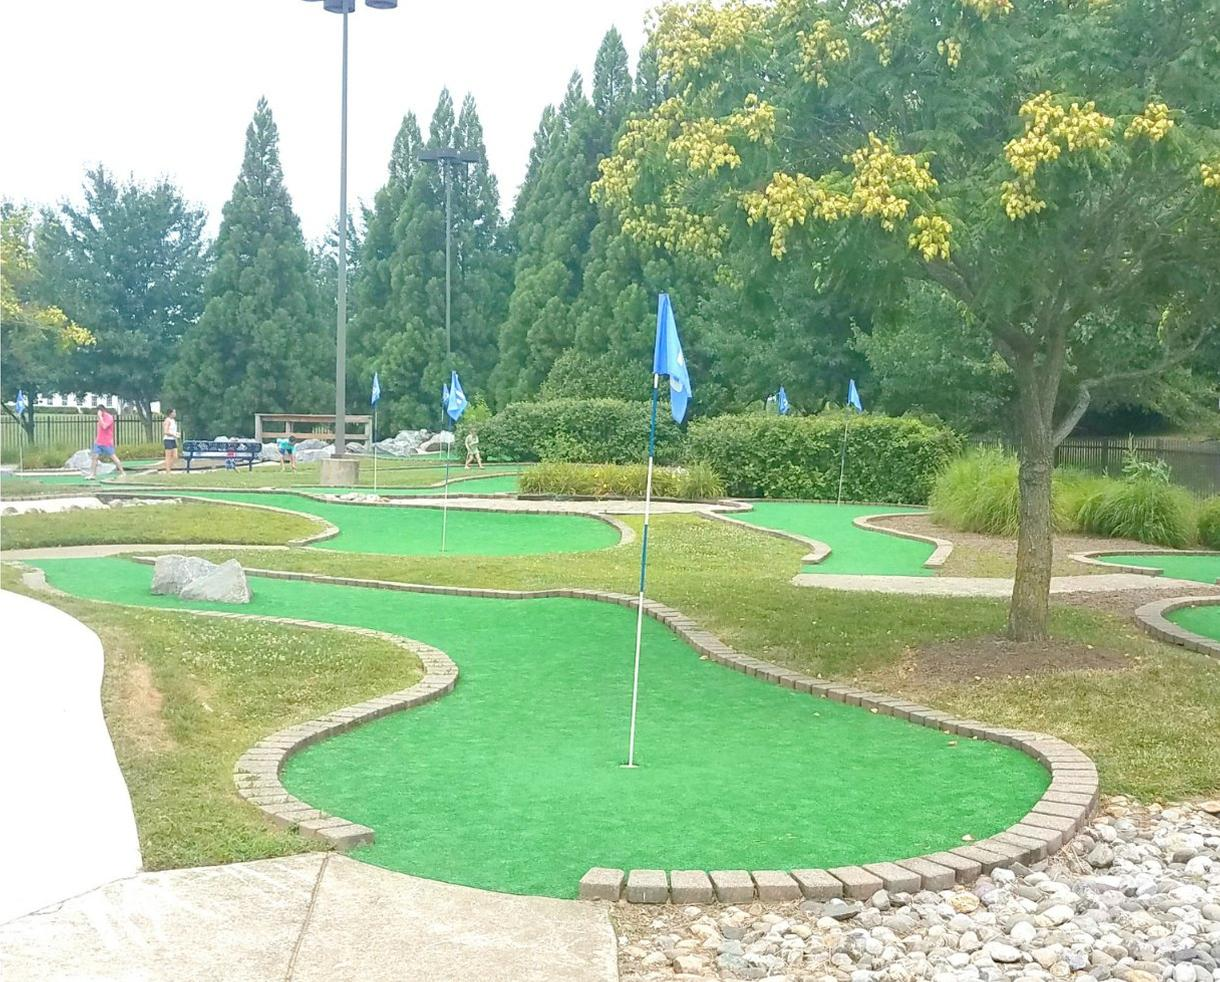 South Germantown SplashPark and Mini-Golf